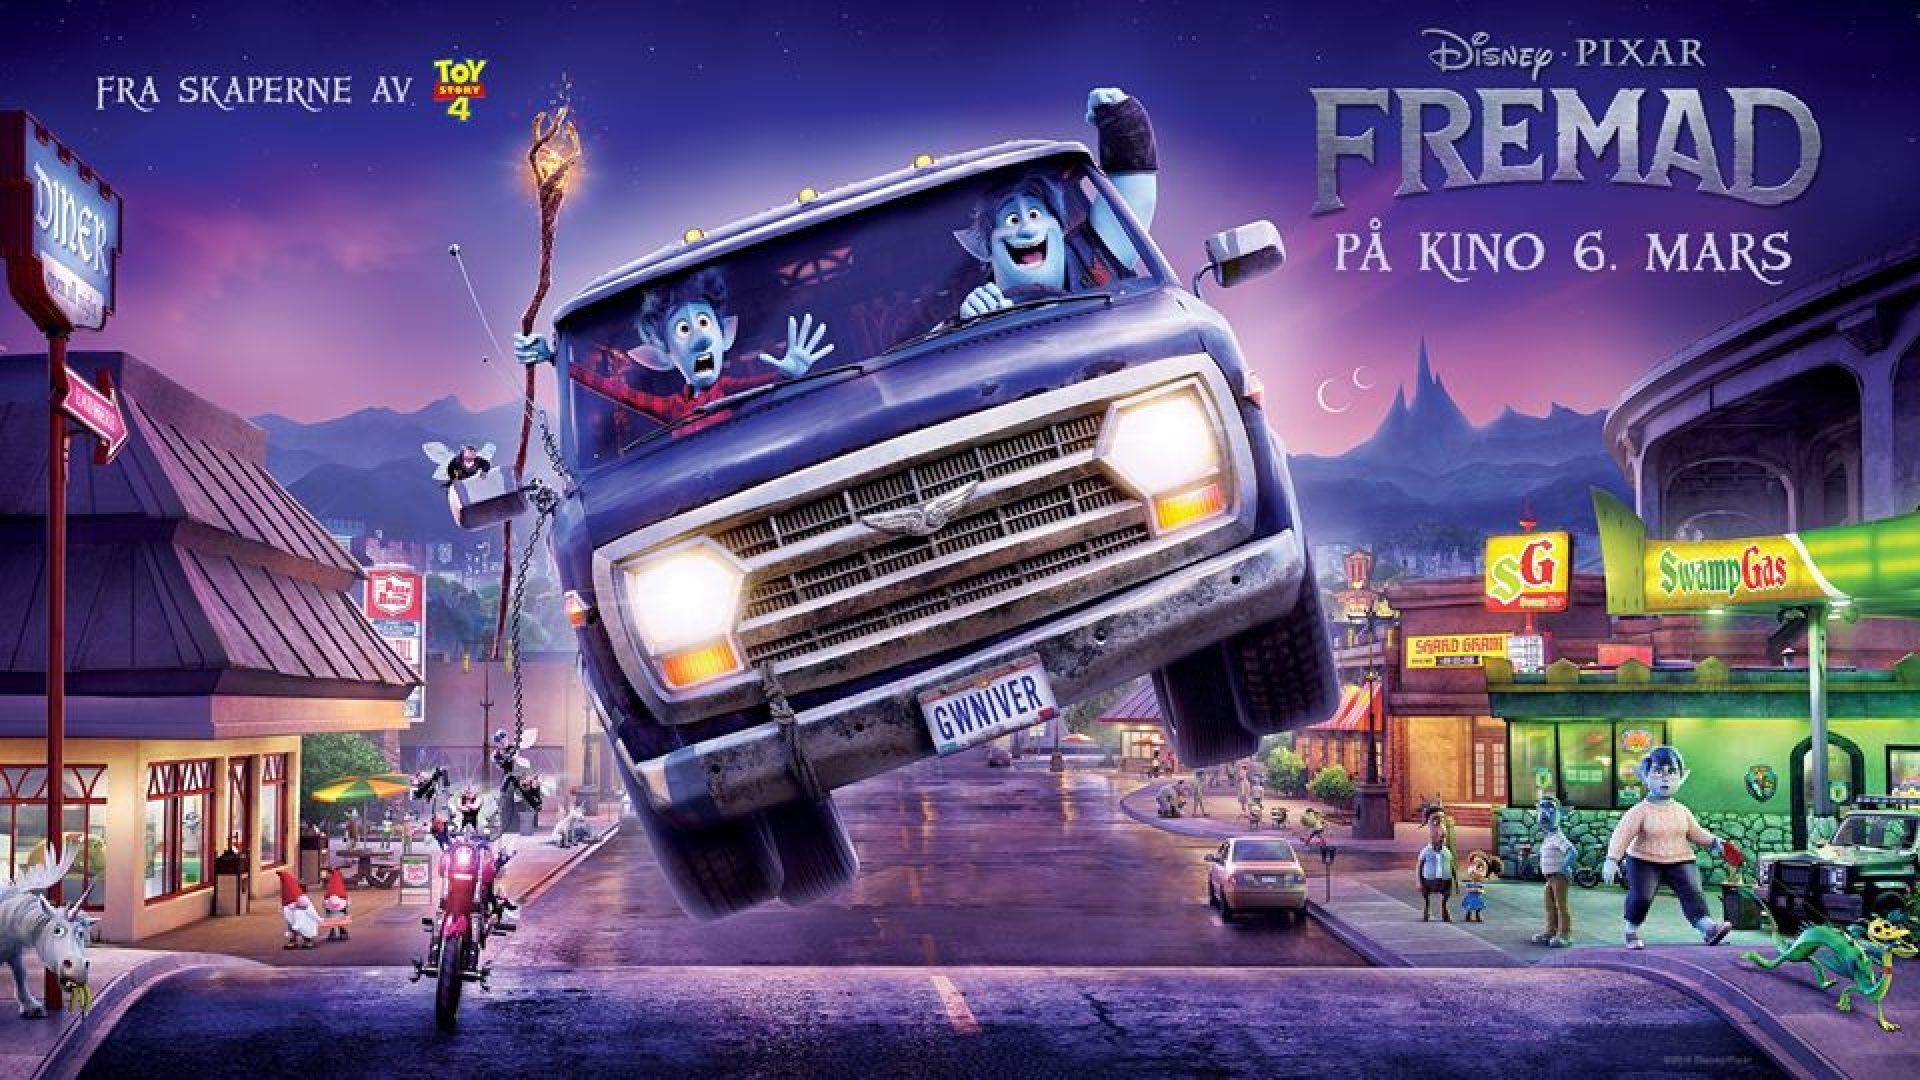 Disney Pixar Fremad